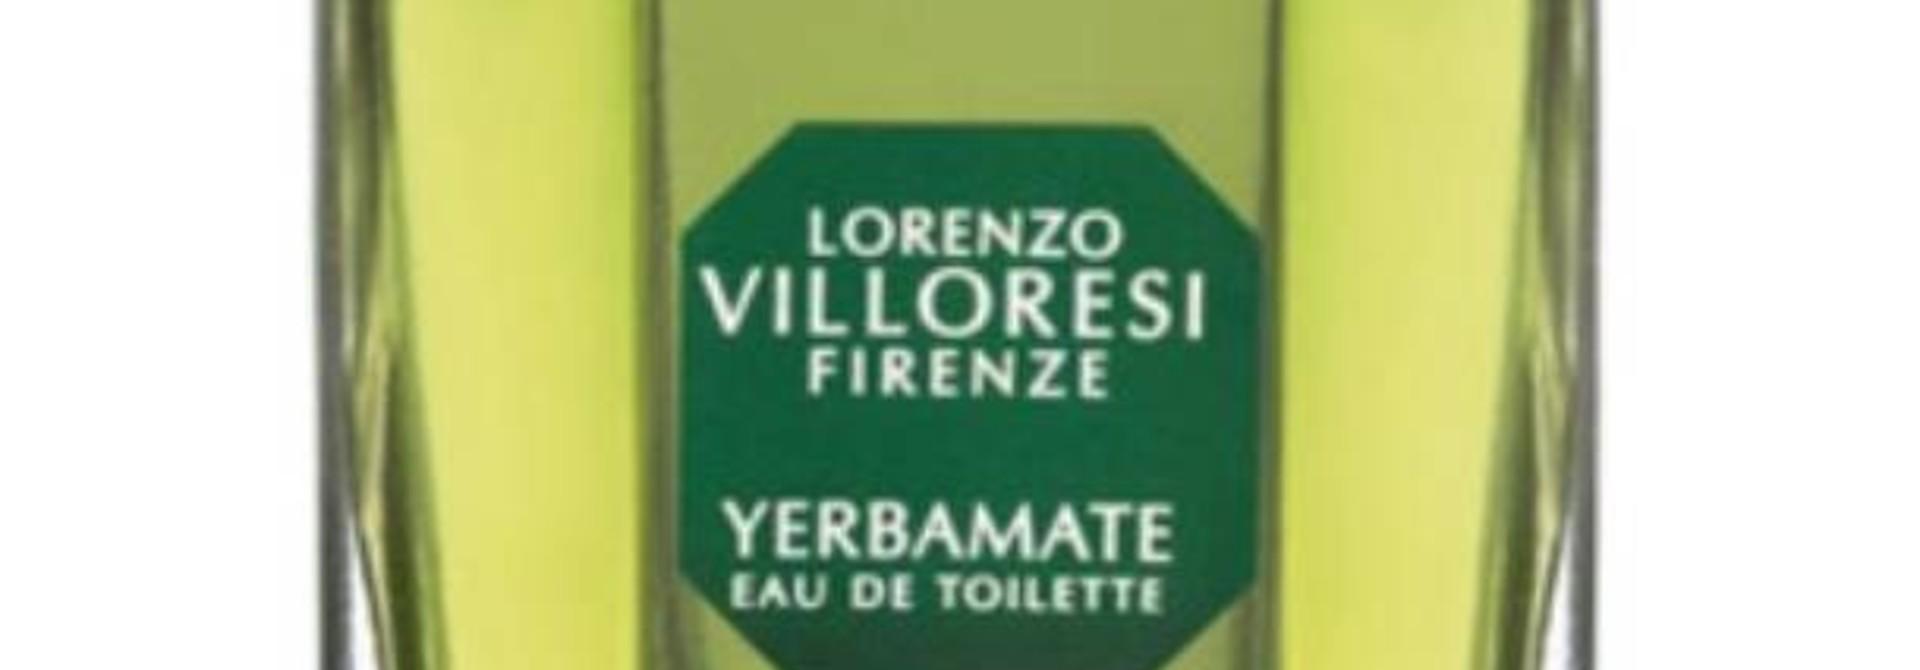 Yerbamate Eau De Toilette